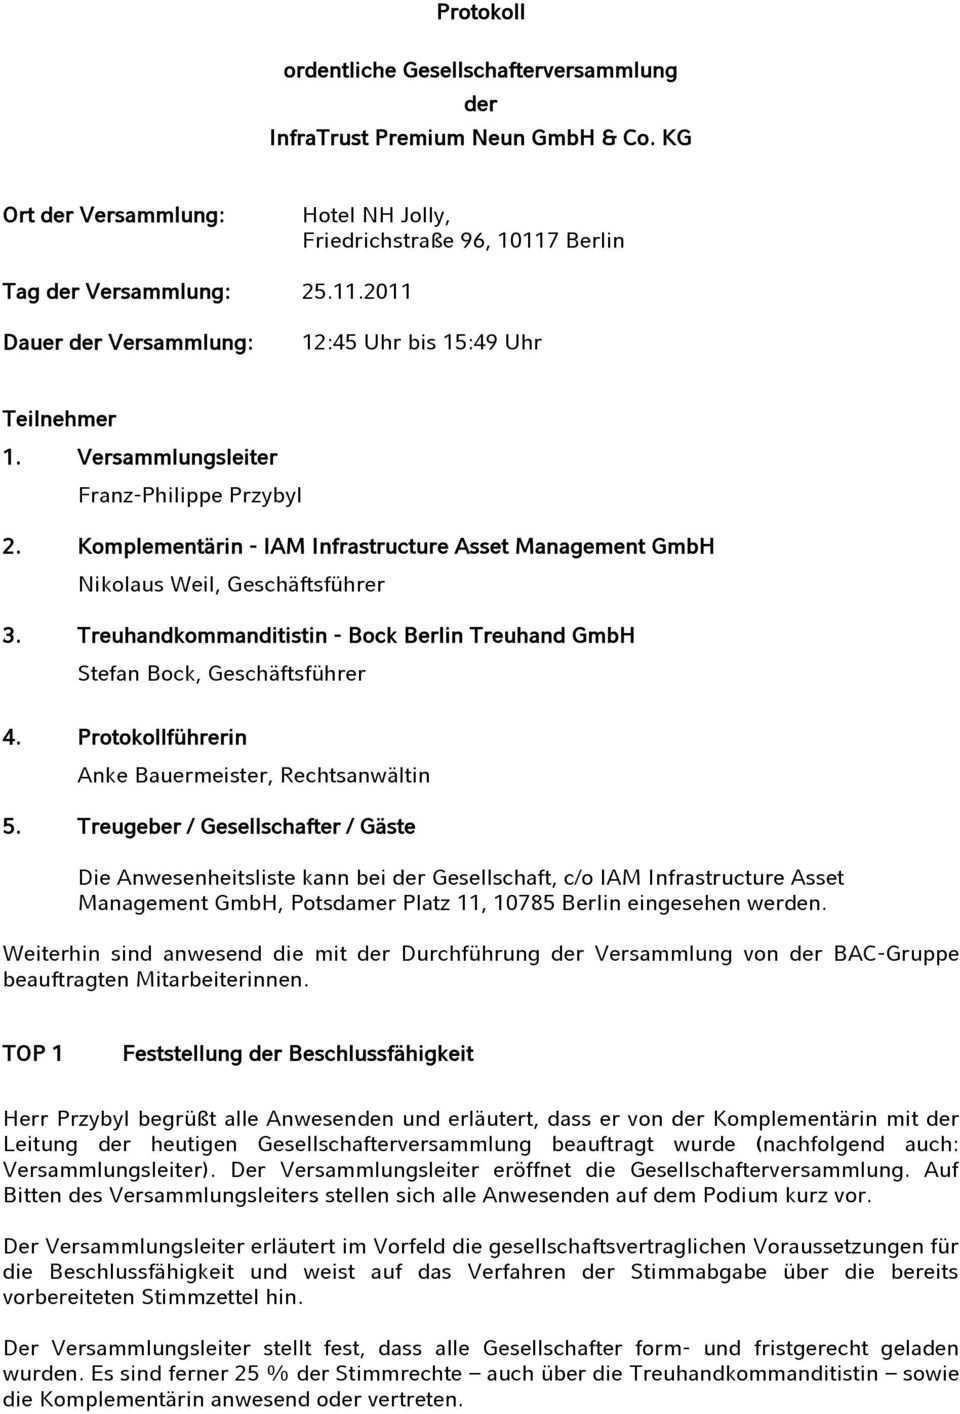 Protokoll Ordentliche Gesellschafterversammlung Der Infratrust Premium Neun Gmbh Co Kg Friedrichstrasse 96 Berlin Pdf Free Download